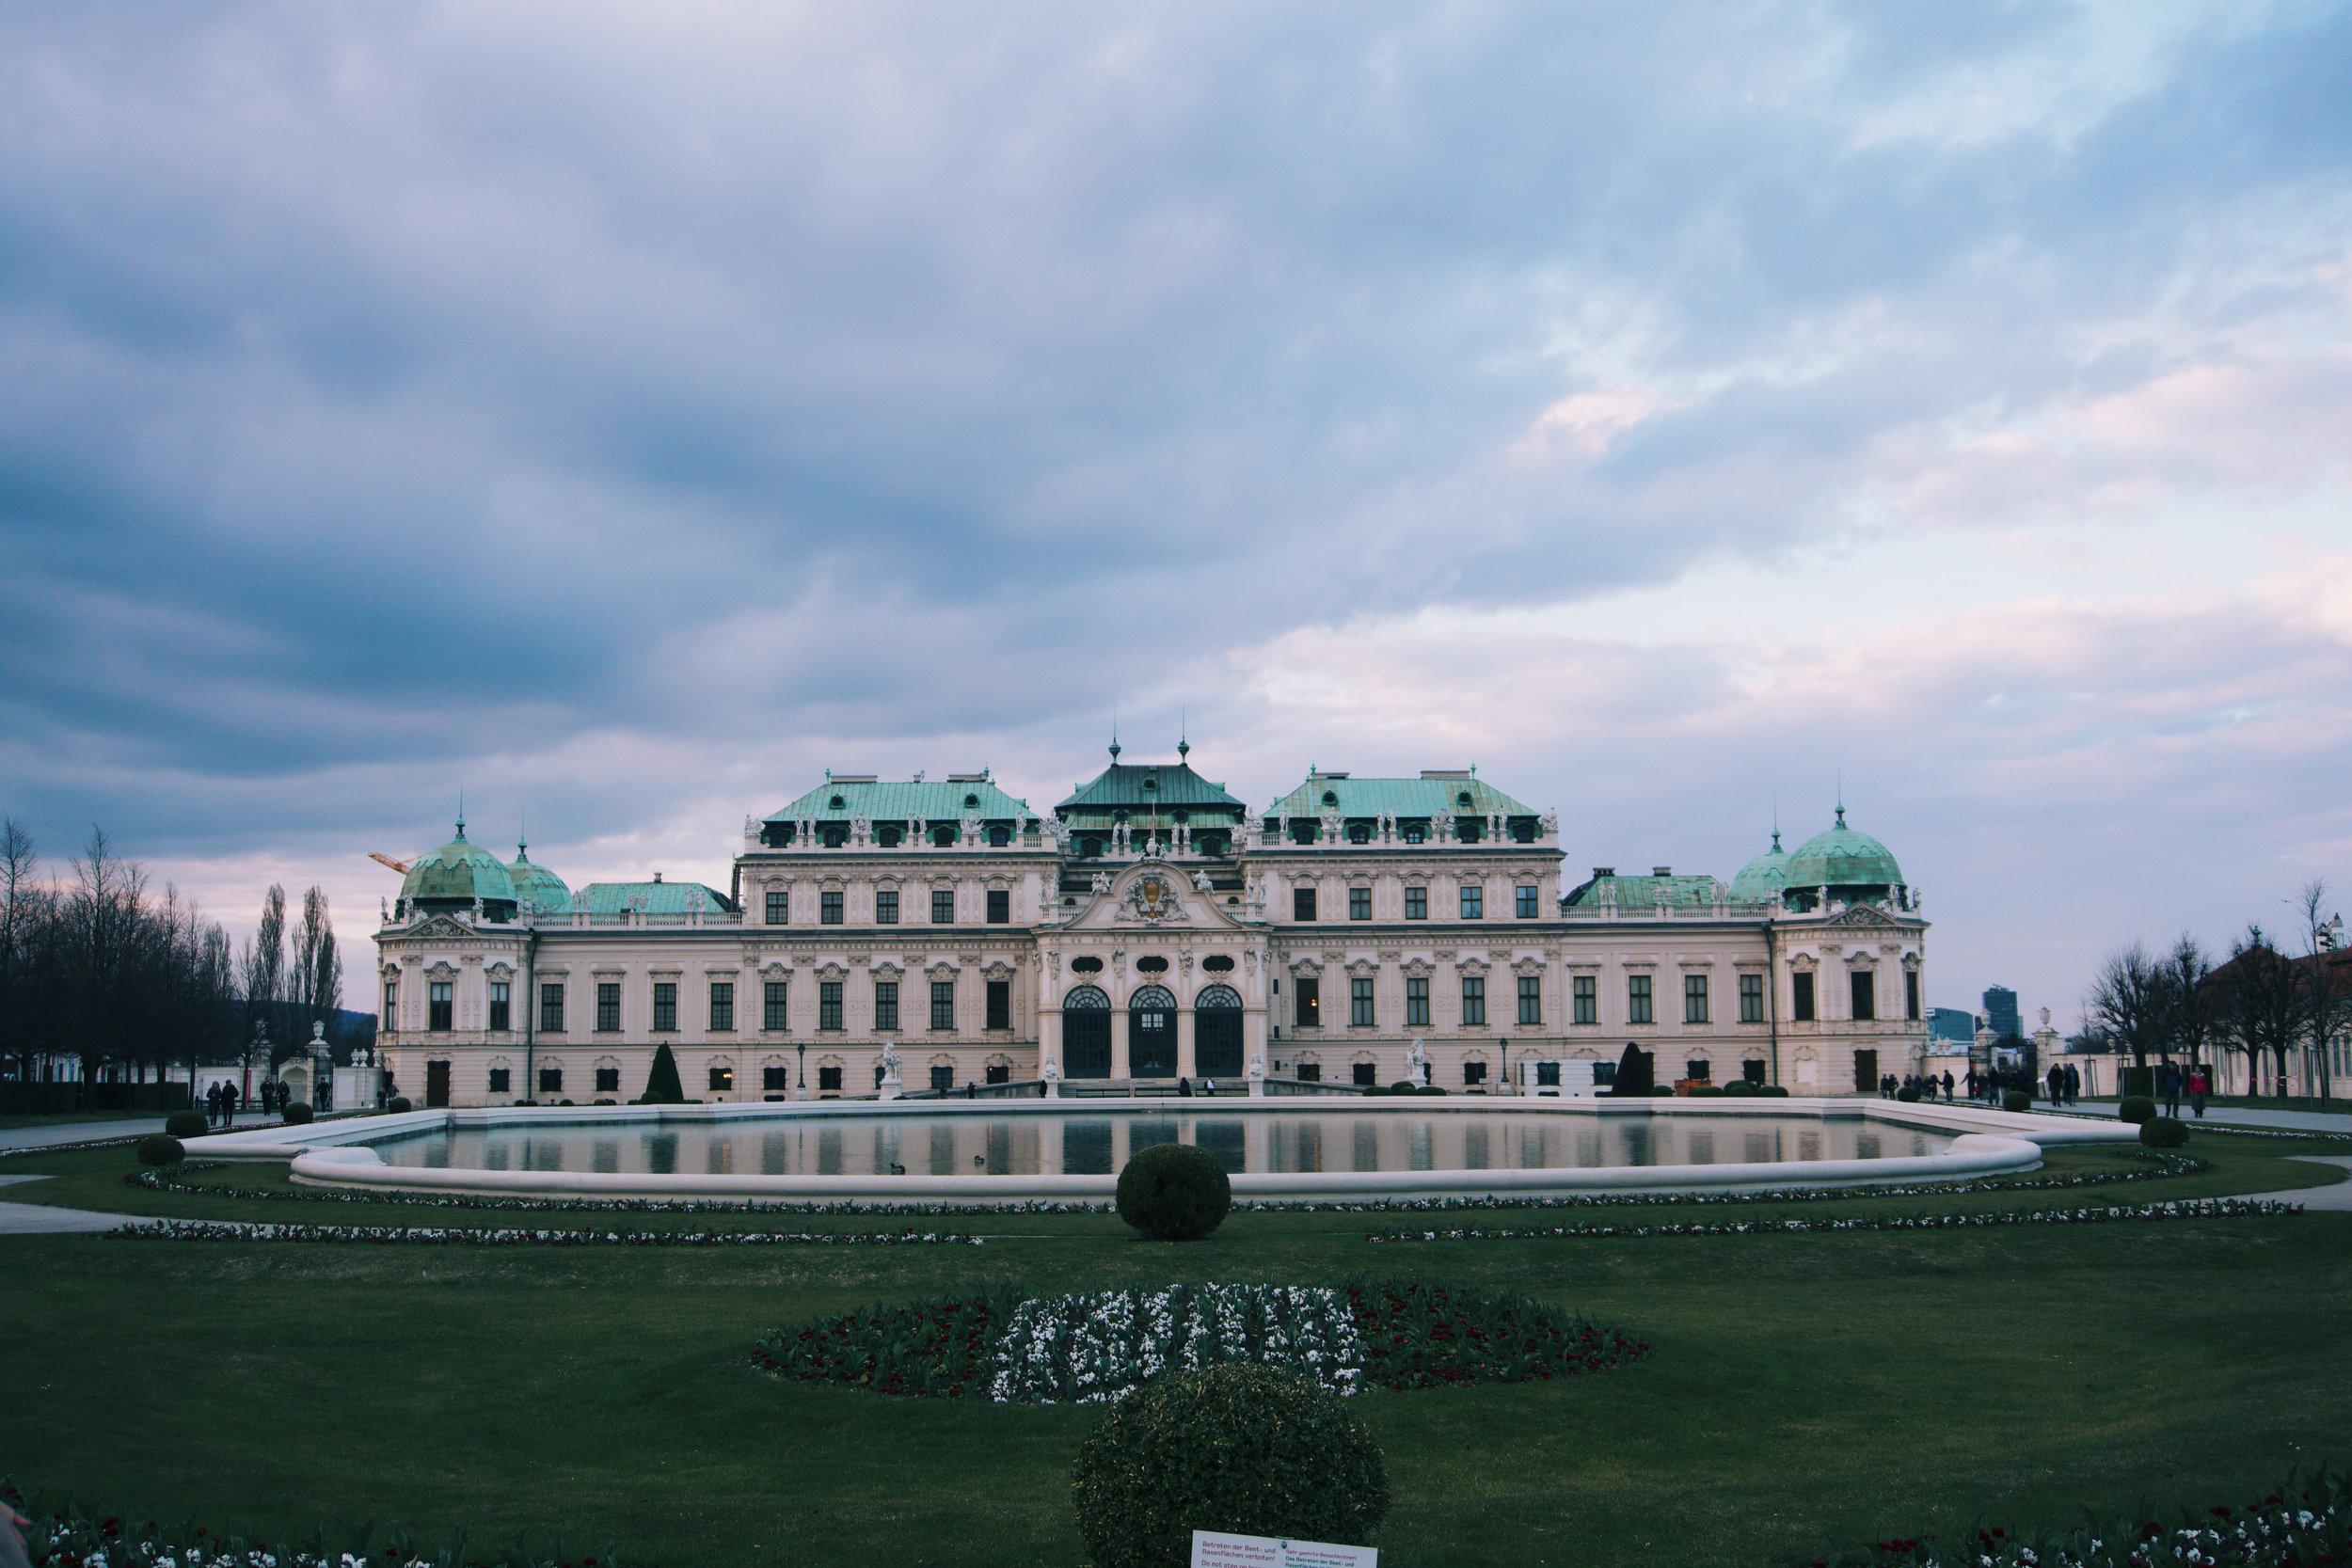 scchonbrunn palace